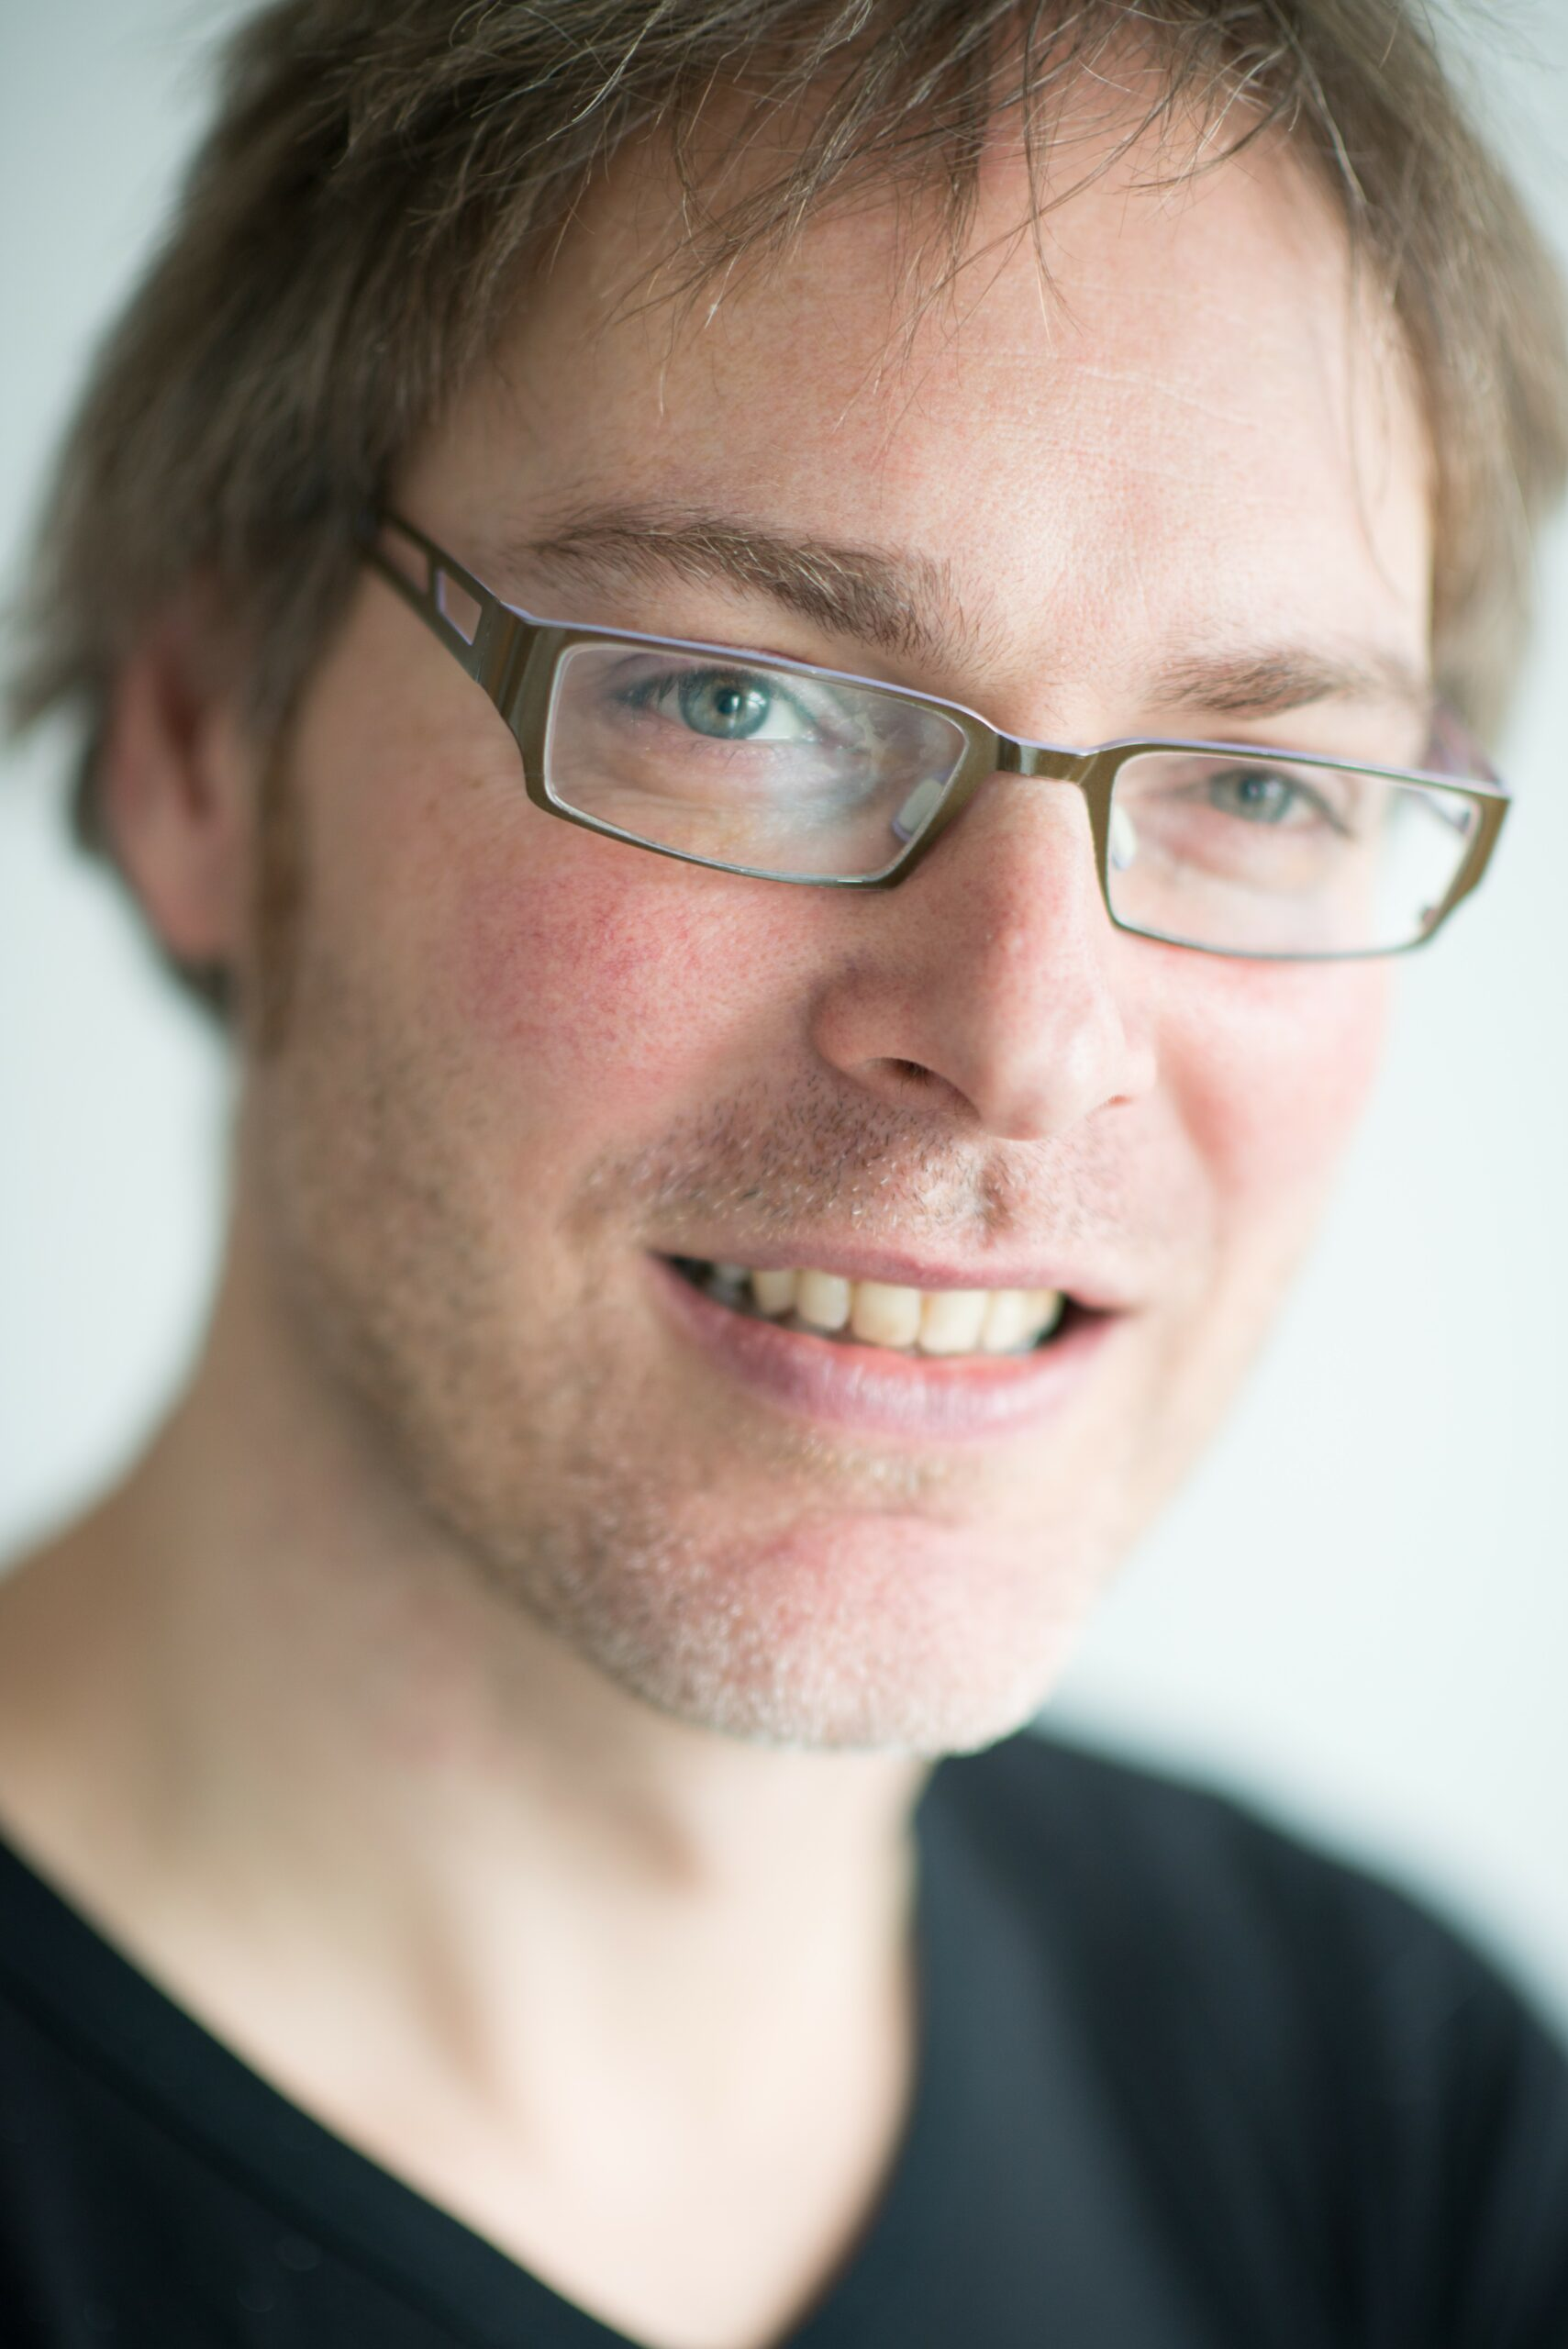 Prof. Diether Lambrechts (VIB-KU Leuven)